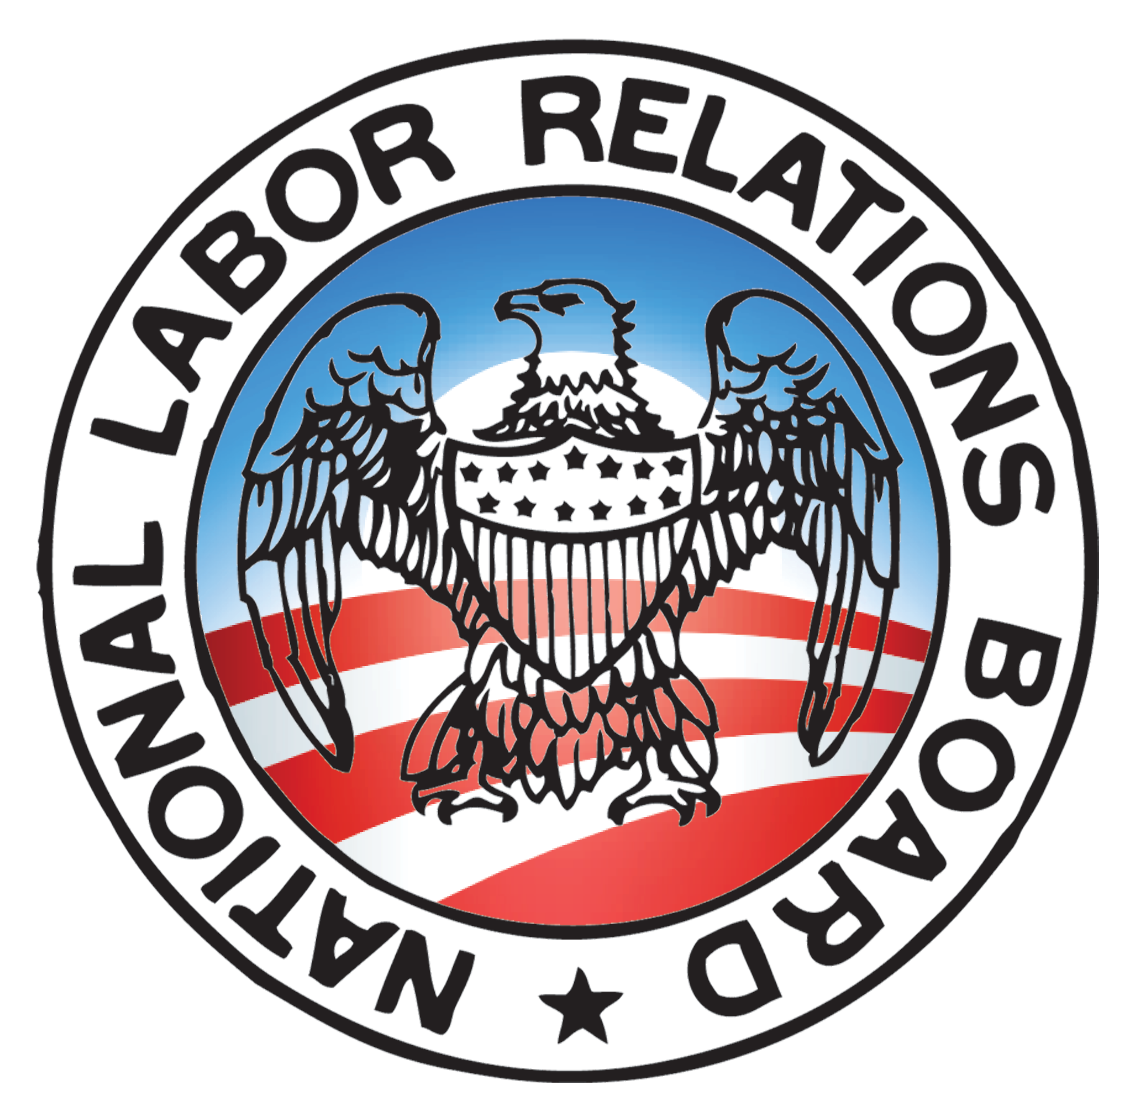 LaborUnionReport.com: BREAKING: NLRB's General Counsel